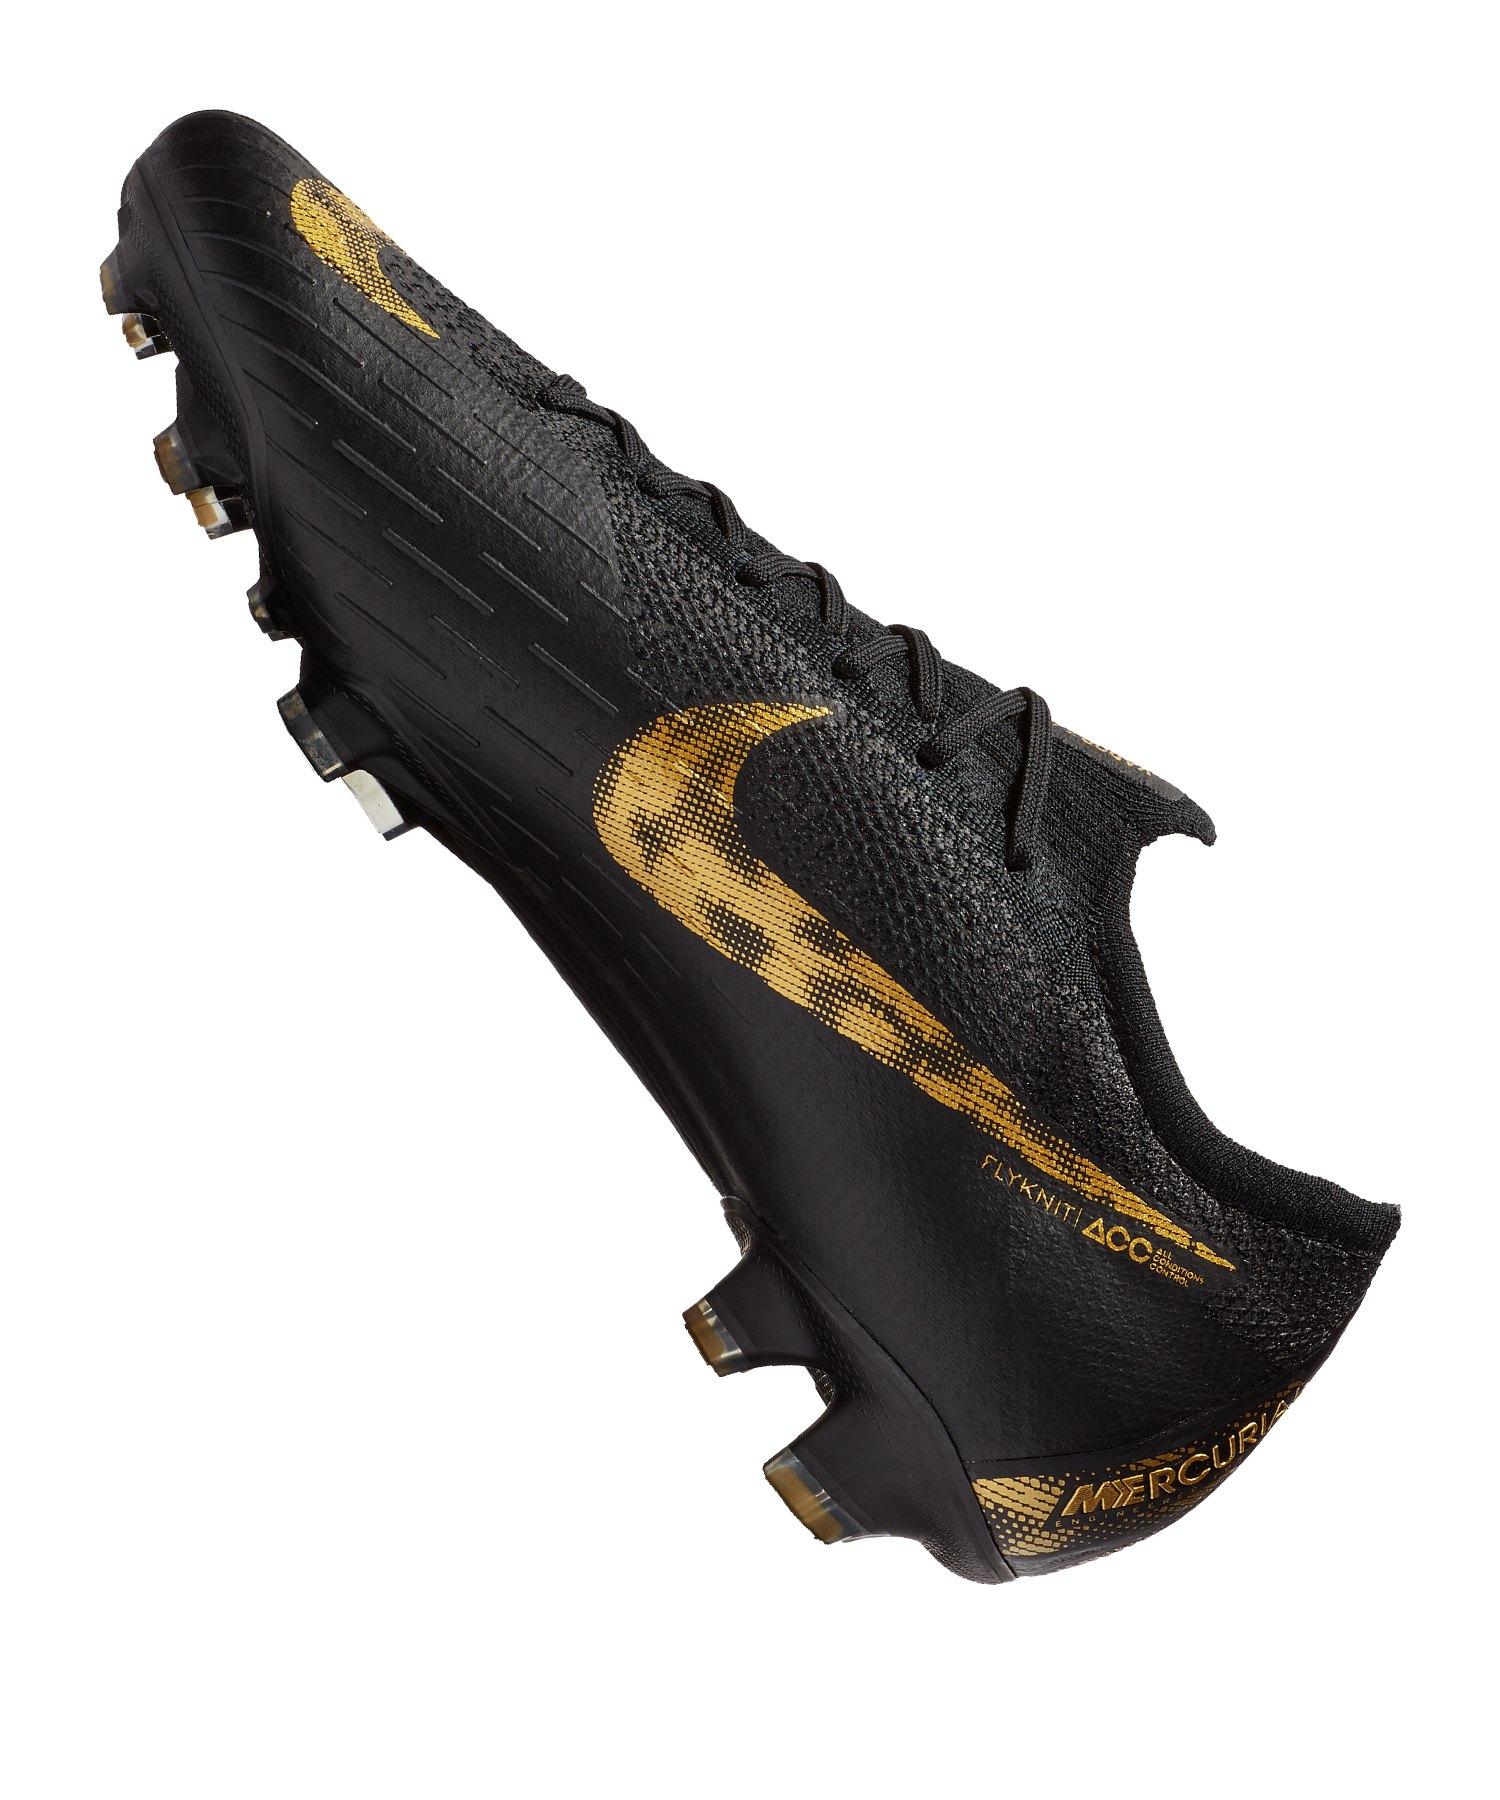 huge selection of 015c3 3f3ea ... Nike Mercurial Vapor XII Elite FG Schwarz F077 - schwarz ...